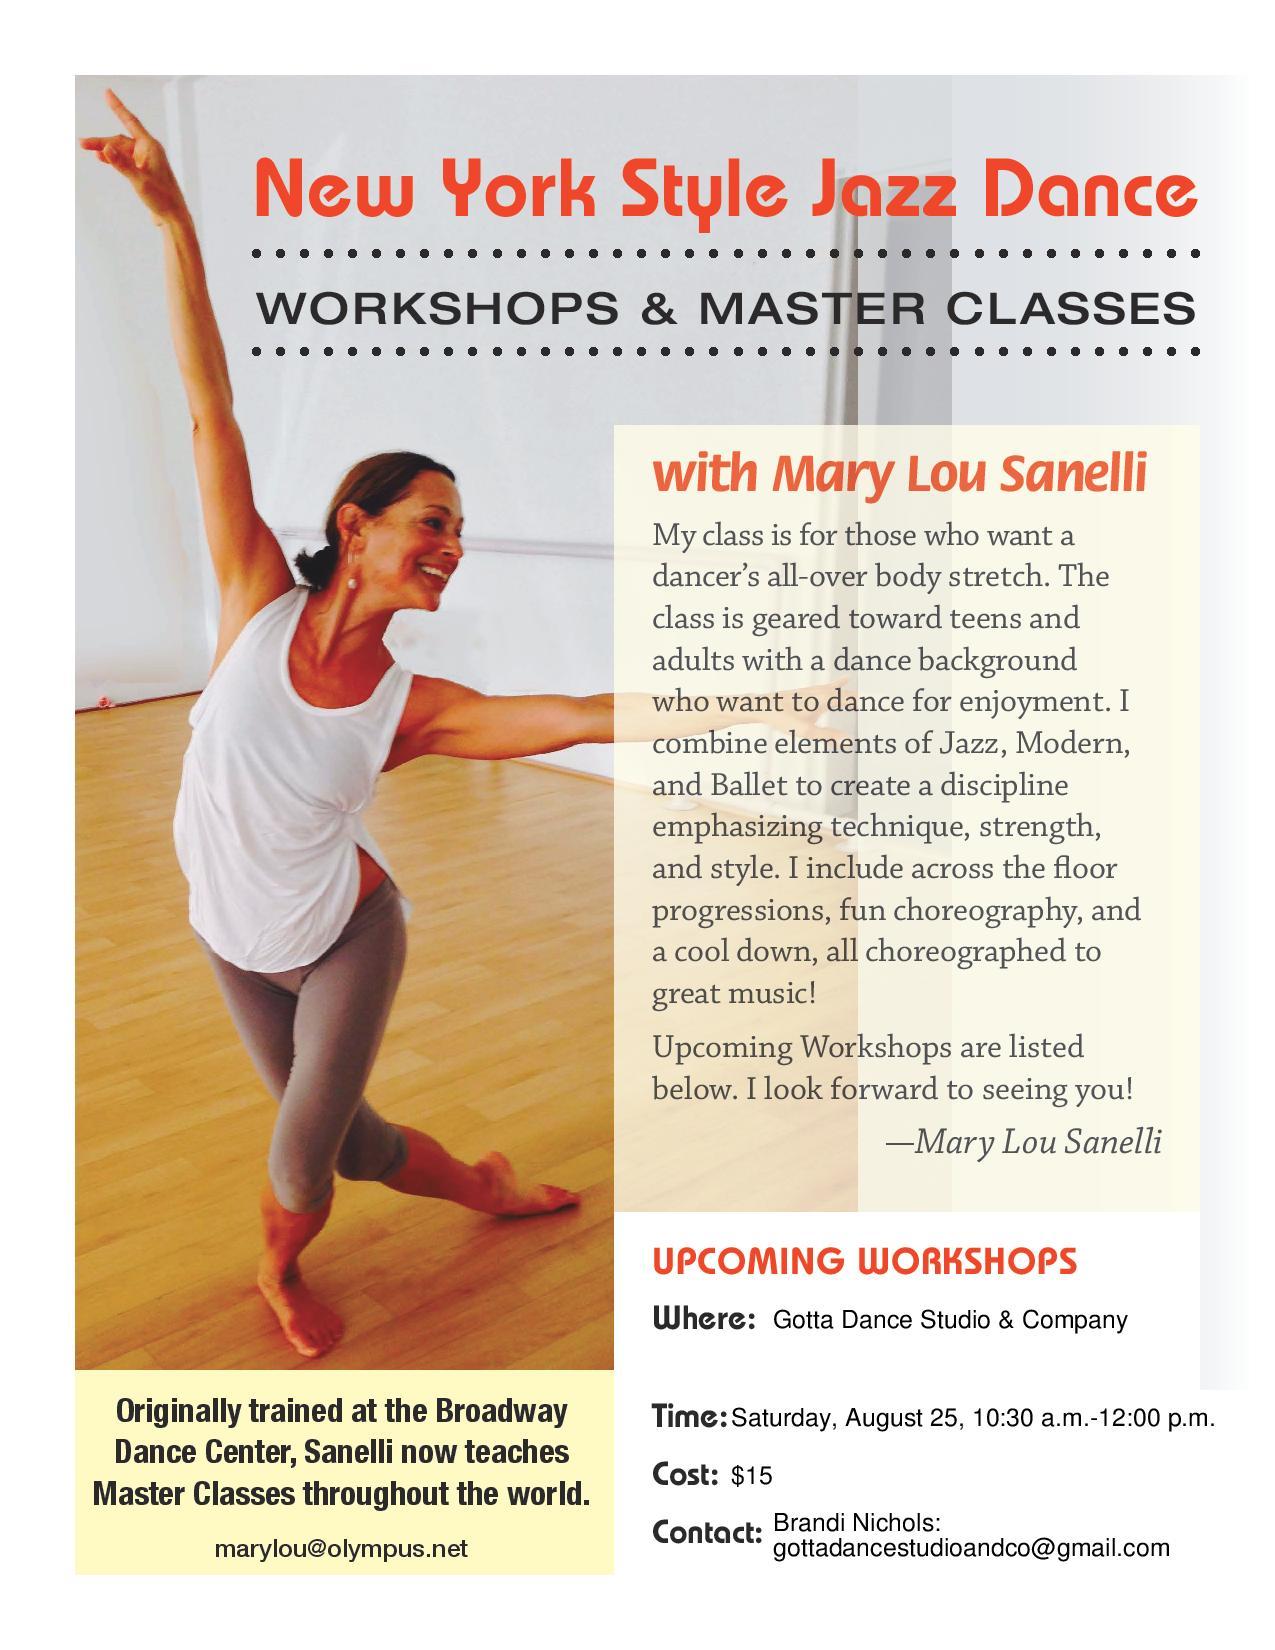 gotta-dance-studio-bend-mary-lou-sanelli-jazz-master